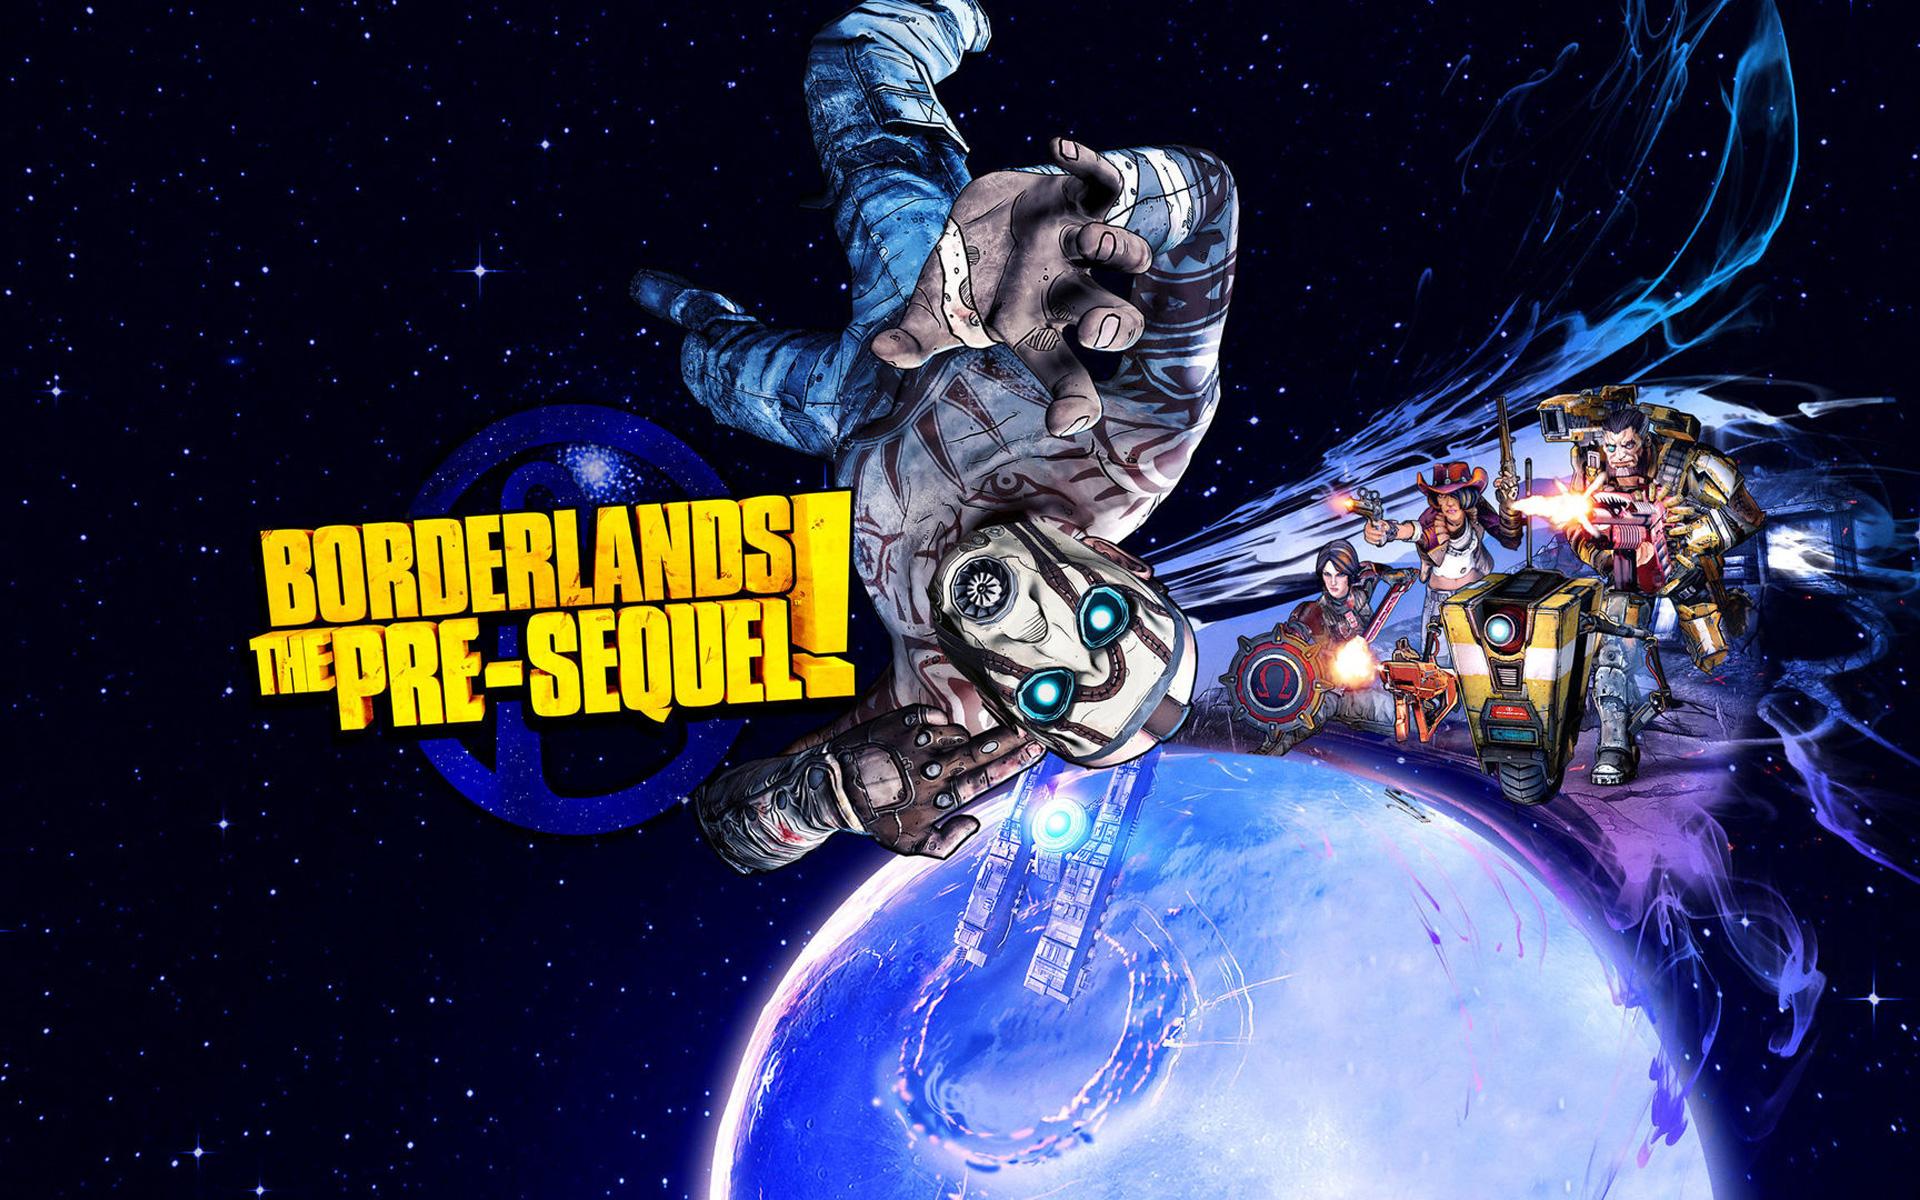 Borderlands: The Pre-Sequel Wallpaper in 1920x1200